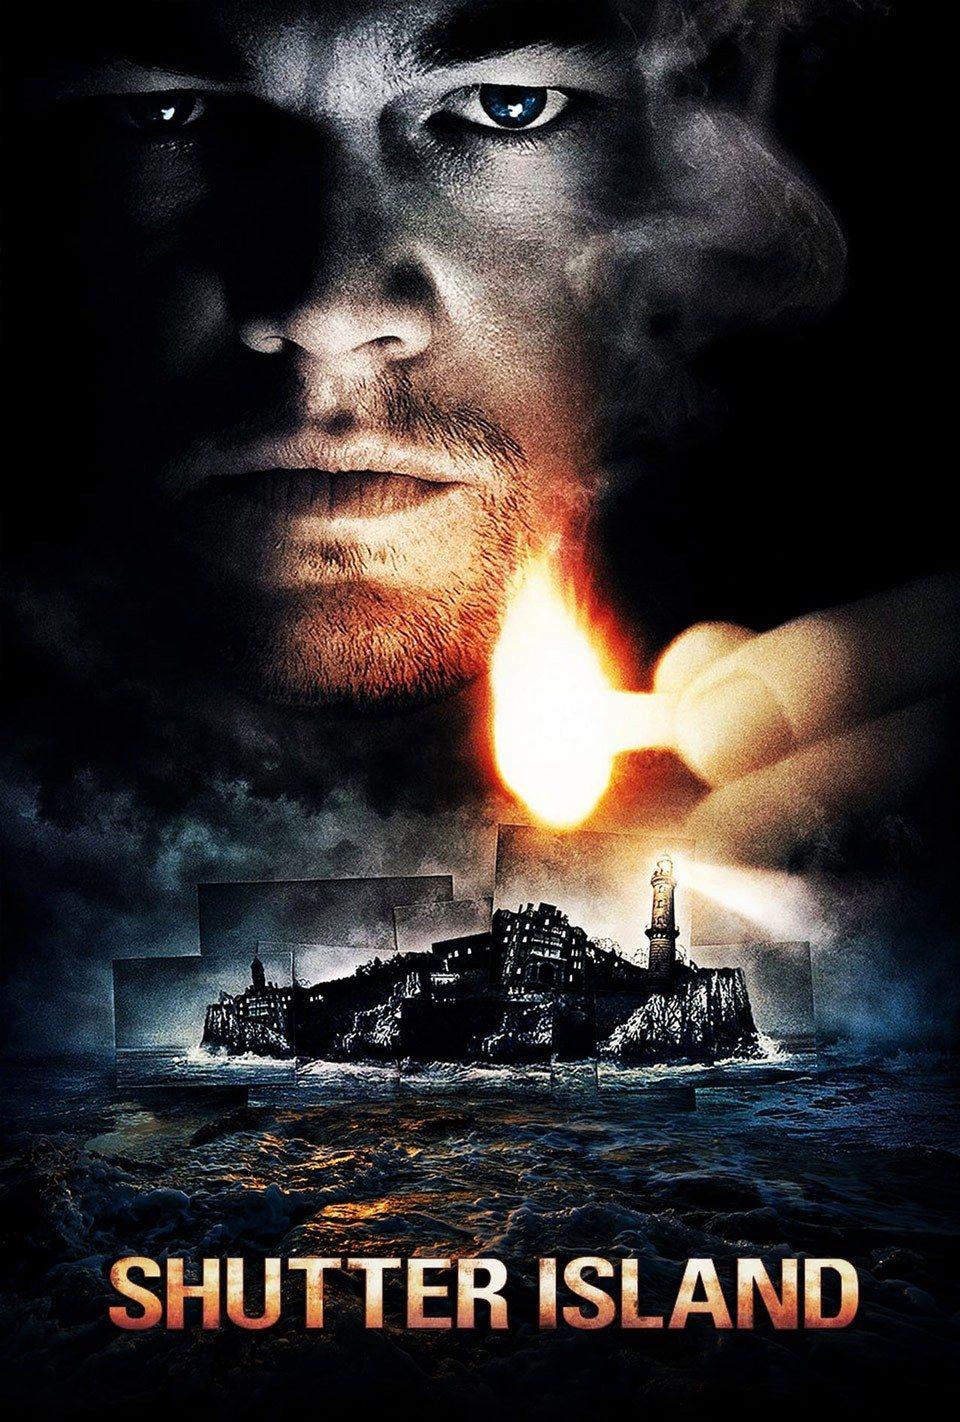 Read The Shutter Island 2010 Script Written By Laeta Kalogridis